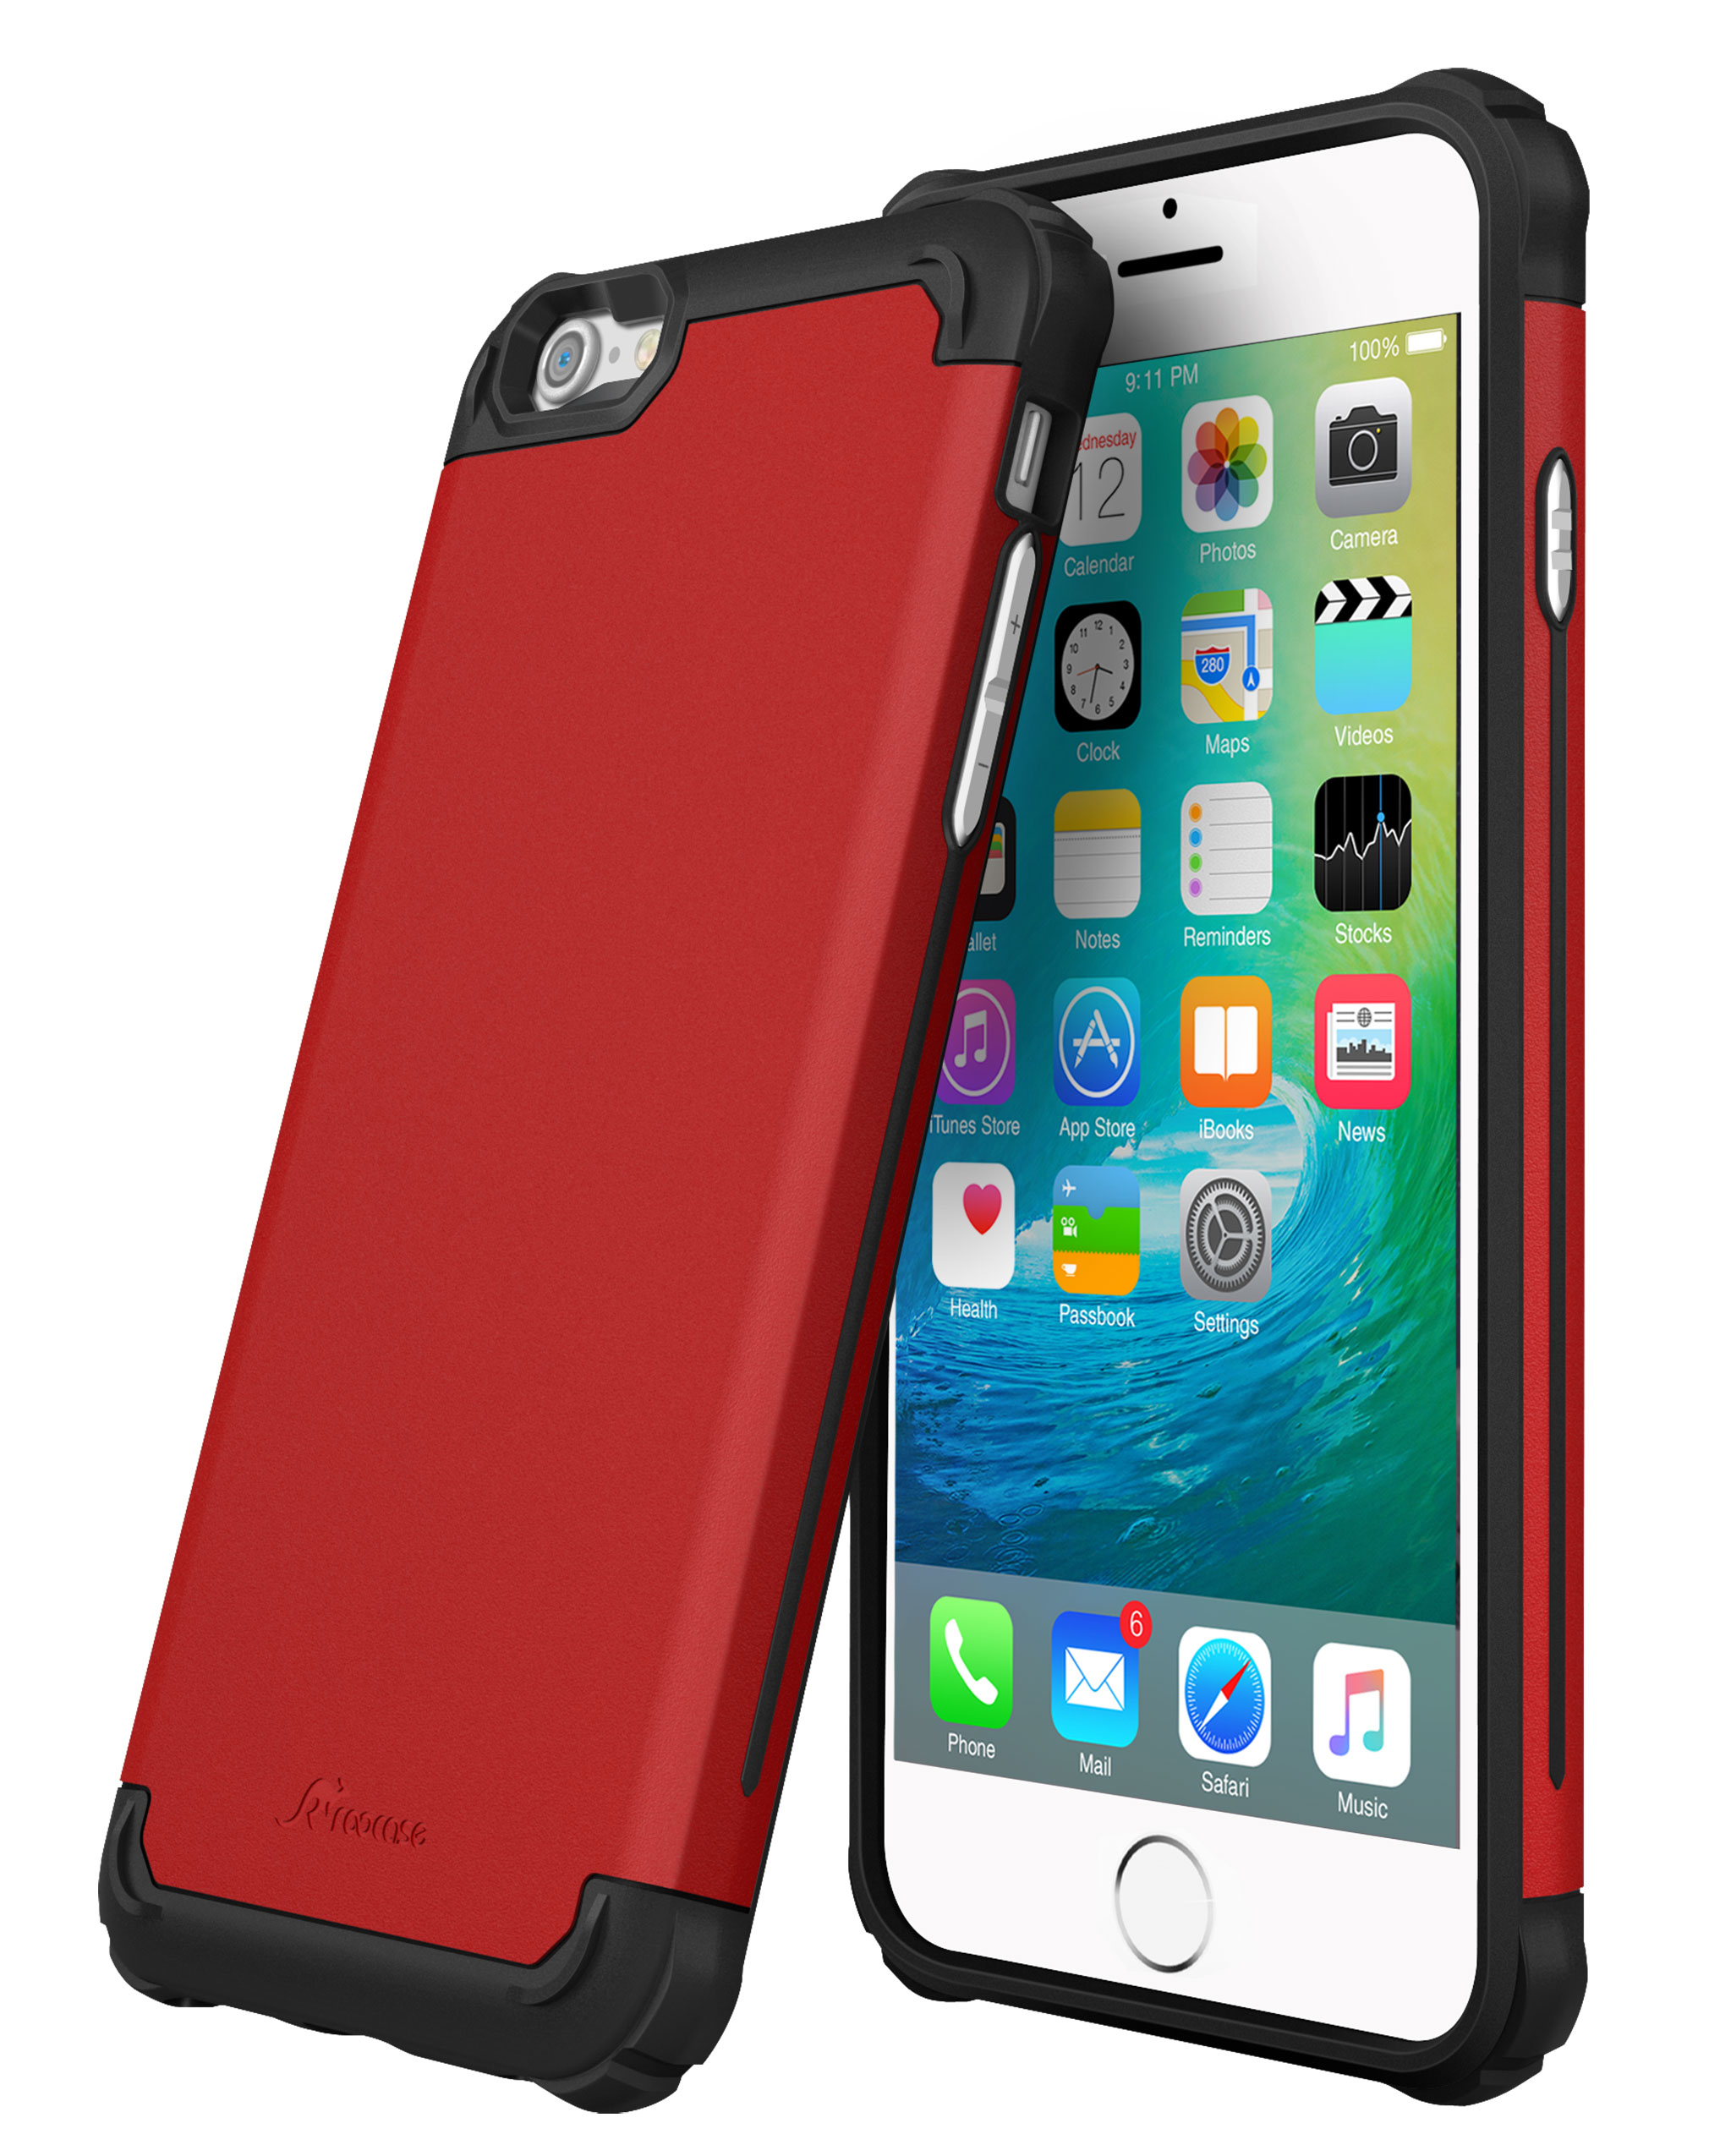 promo code 6847a 20975 iPhone 6s Plus Case, rooCASE Ultra Slim MIL-SPEC Exec Tough Pro Rugged Case  Cover for Apple iPhone 6 Plus / 6s Plus